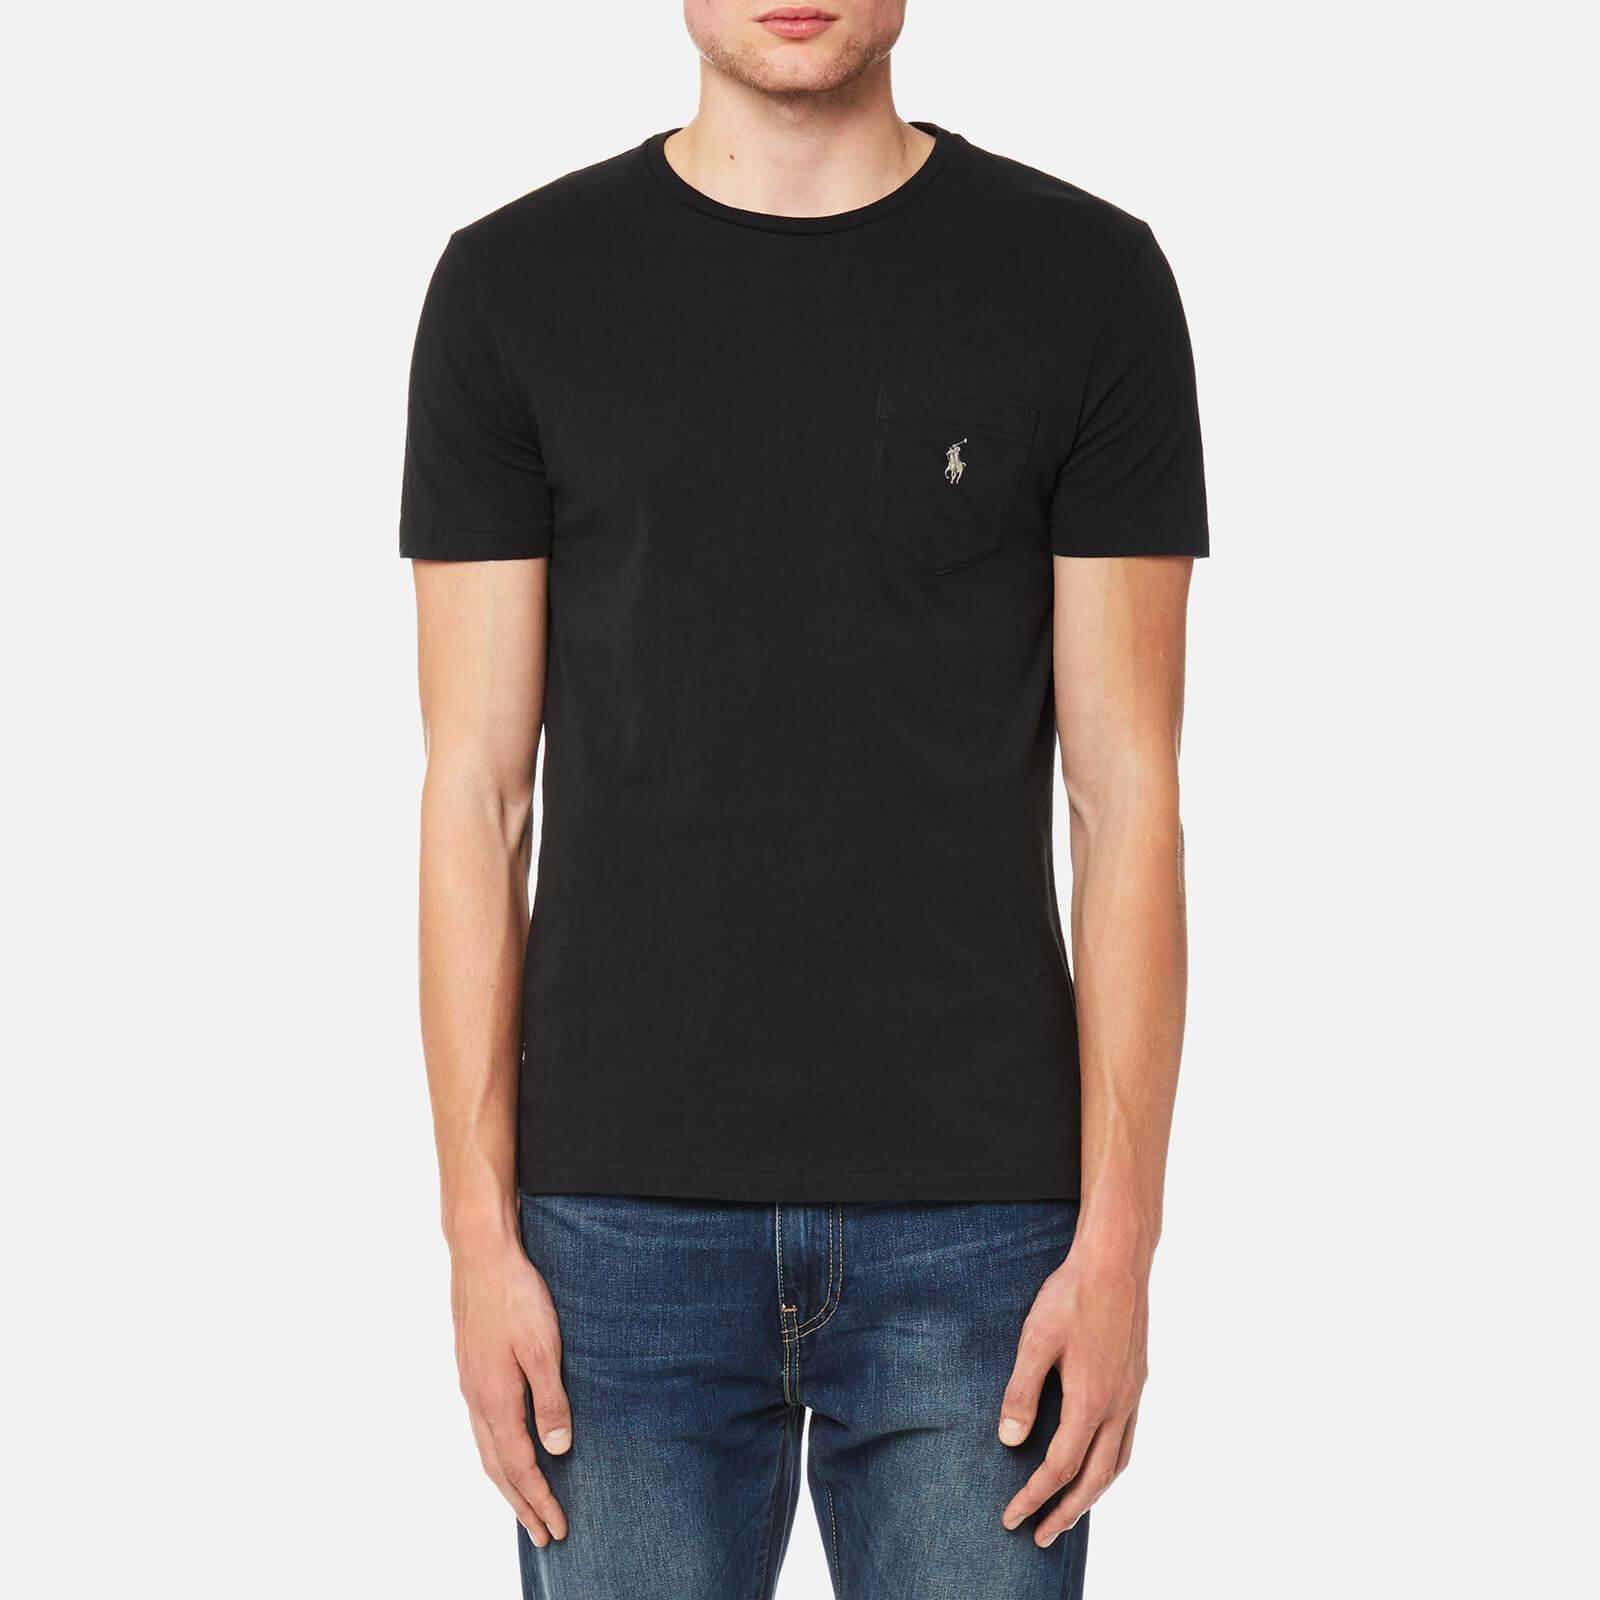 3c2f2b67e19e Polo Ralph Lauren Men s Crew Neck Pocket T-Shirt - Polo Black - Free UK  Delivery over £50